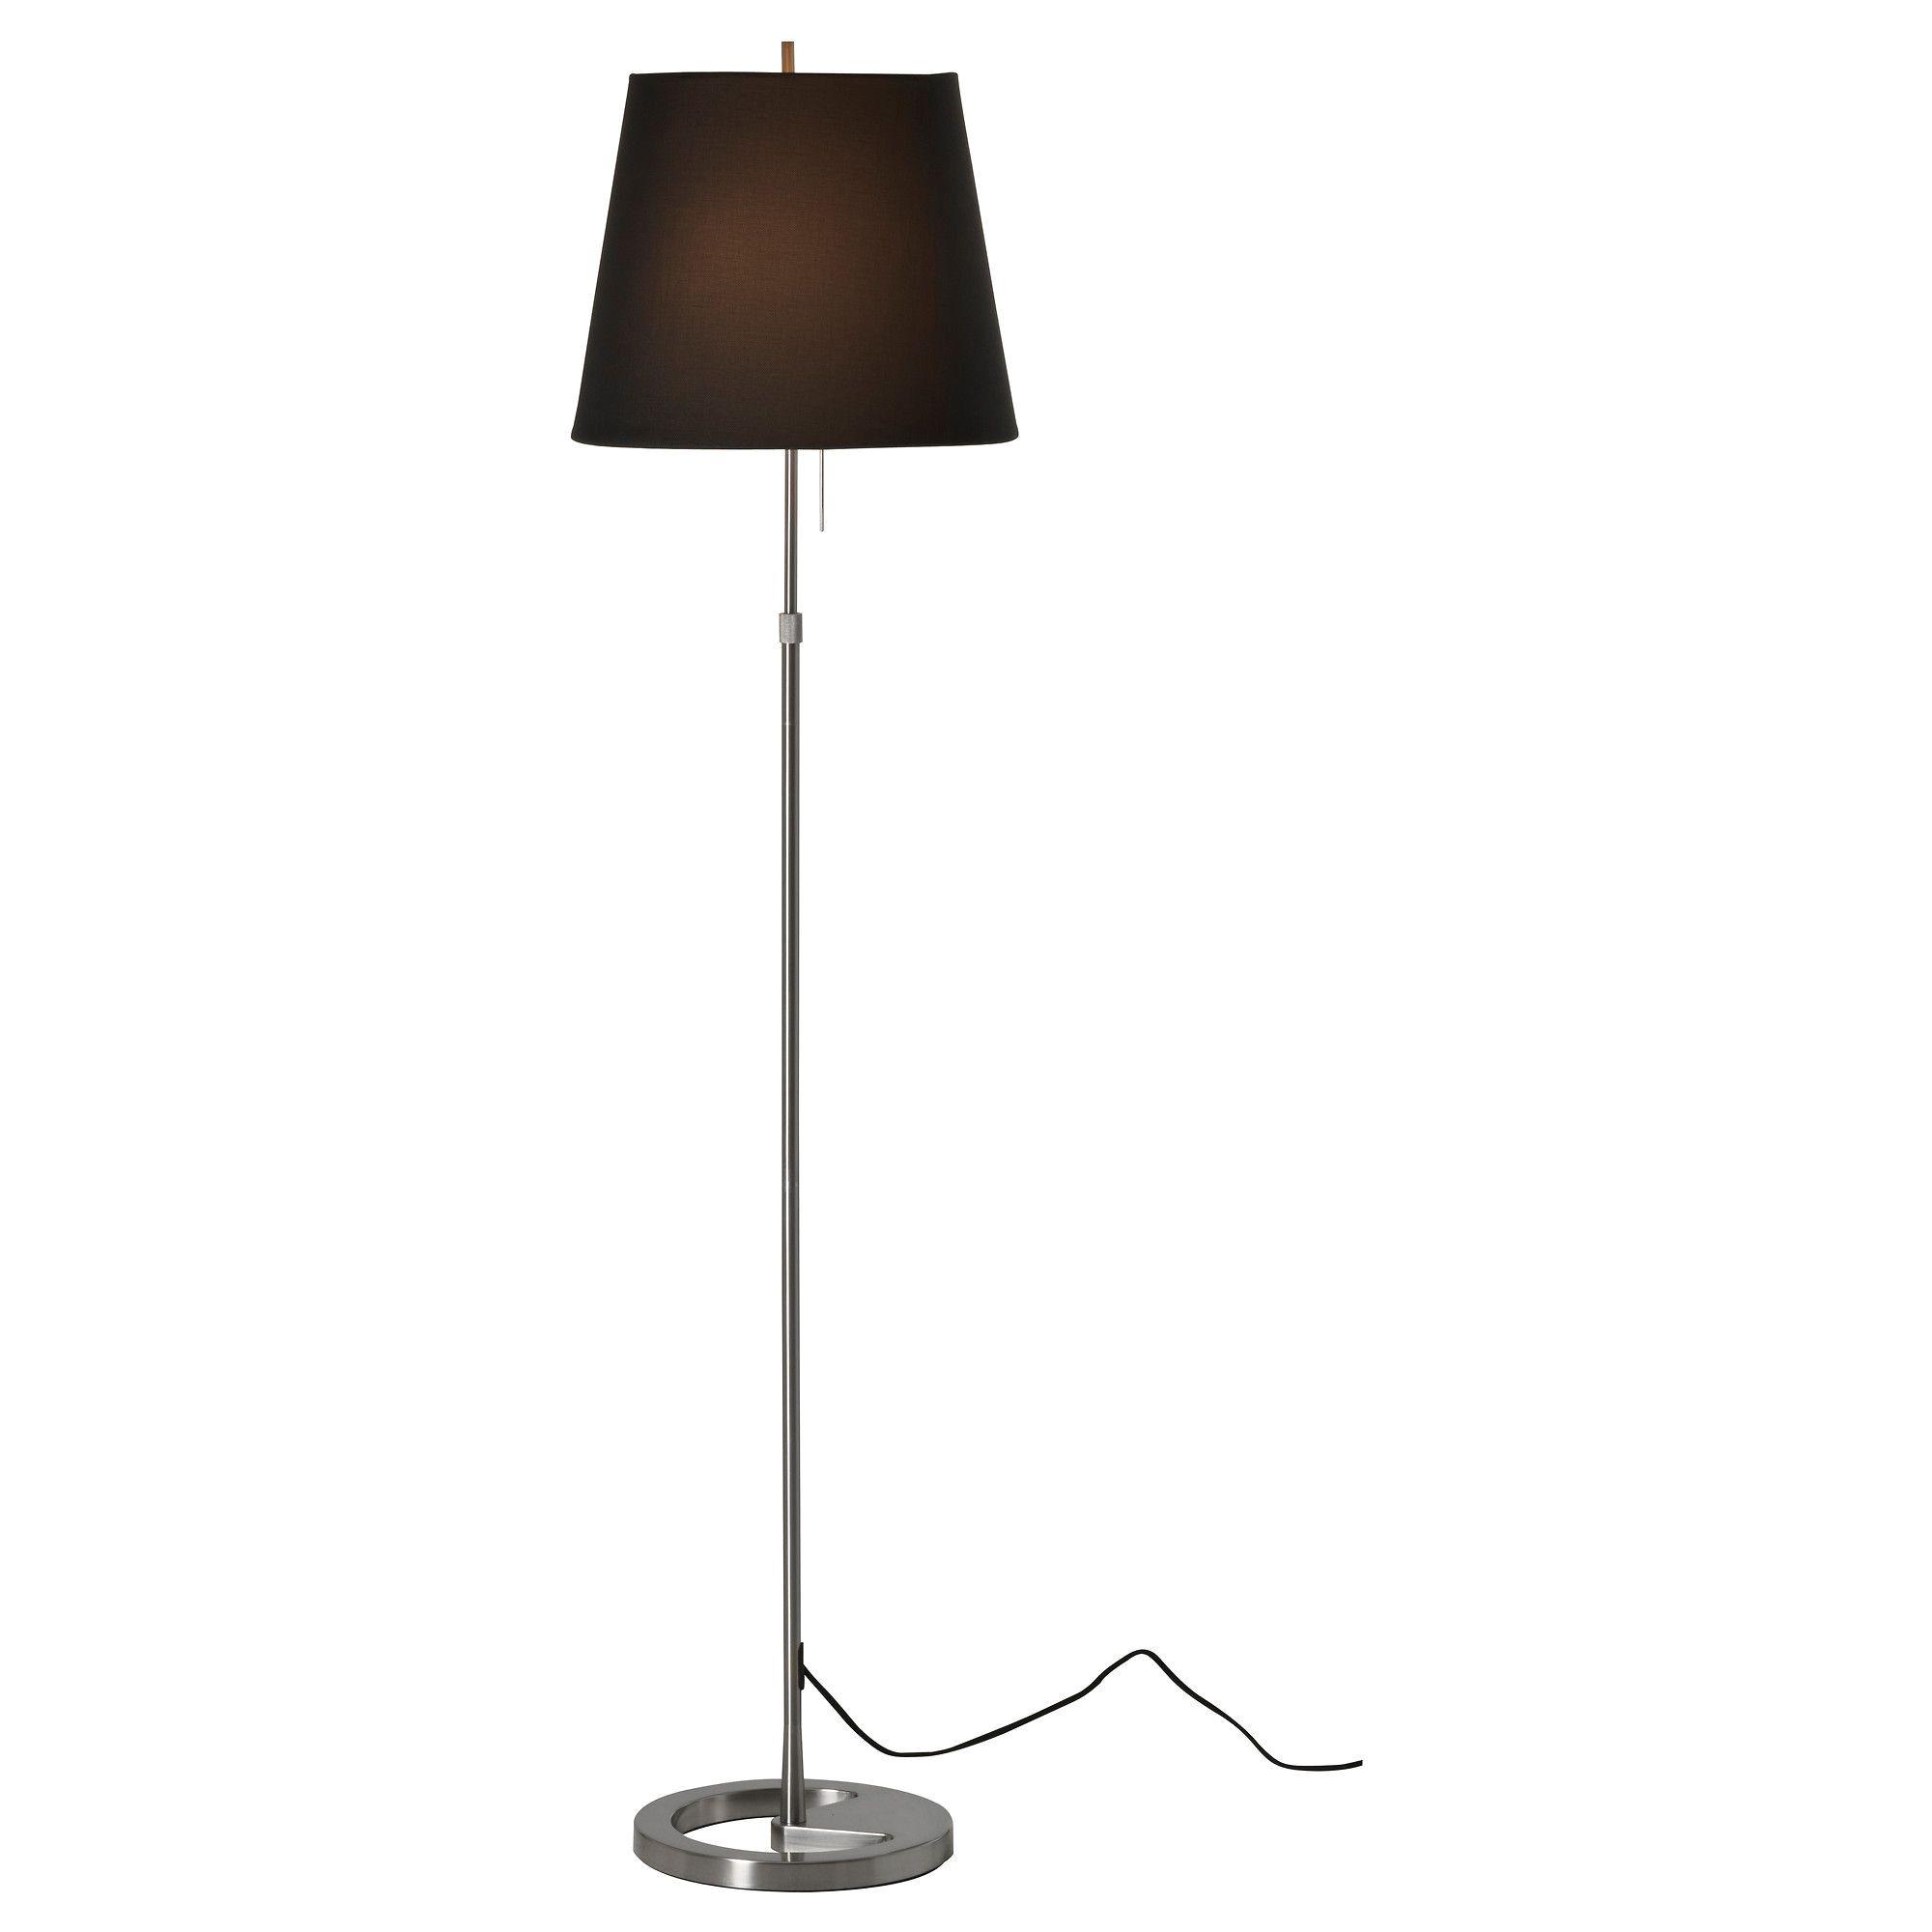 20 Lampe Bureau Ikea Check More At Https Leonstafford Com Lampe